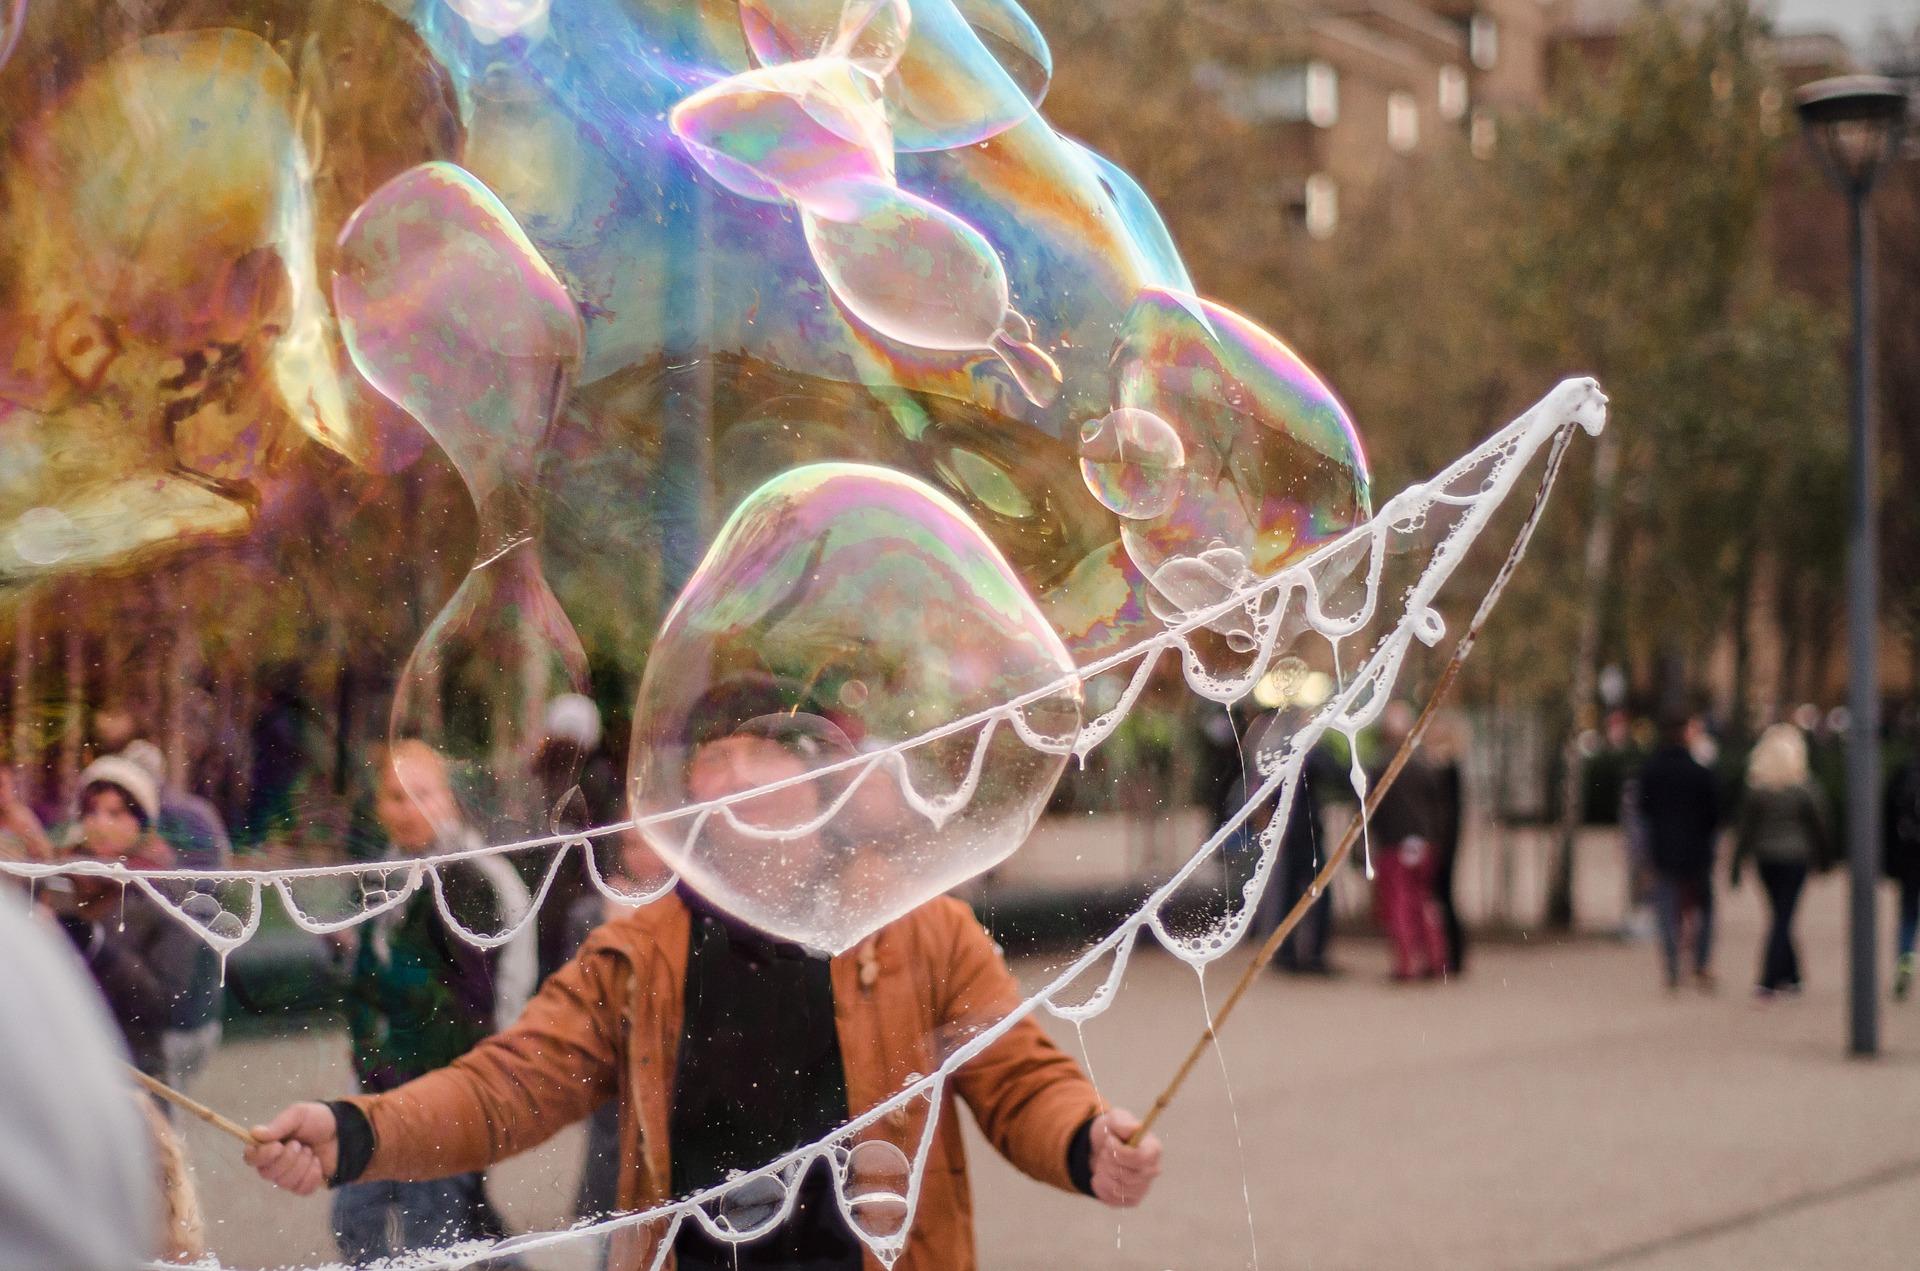 Making bubbles photo